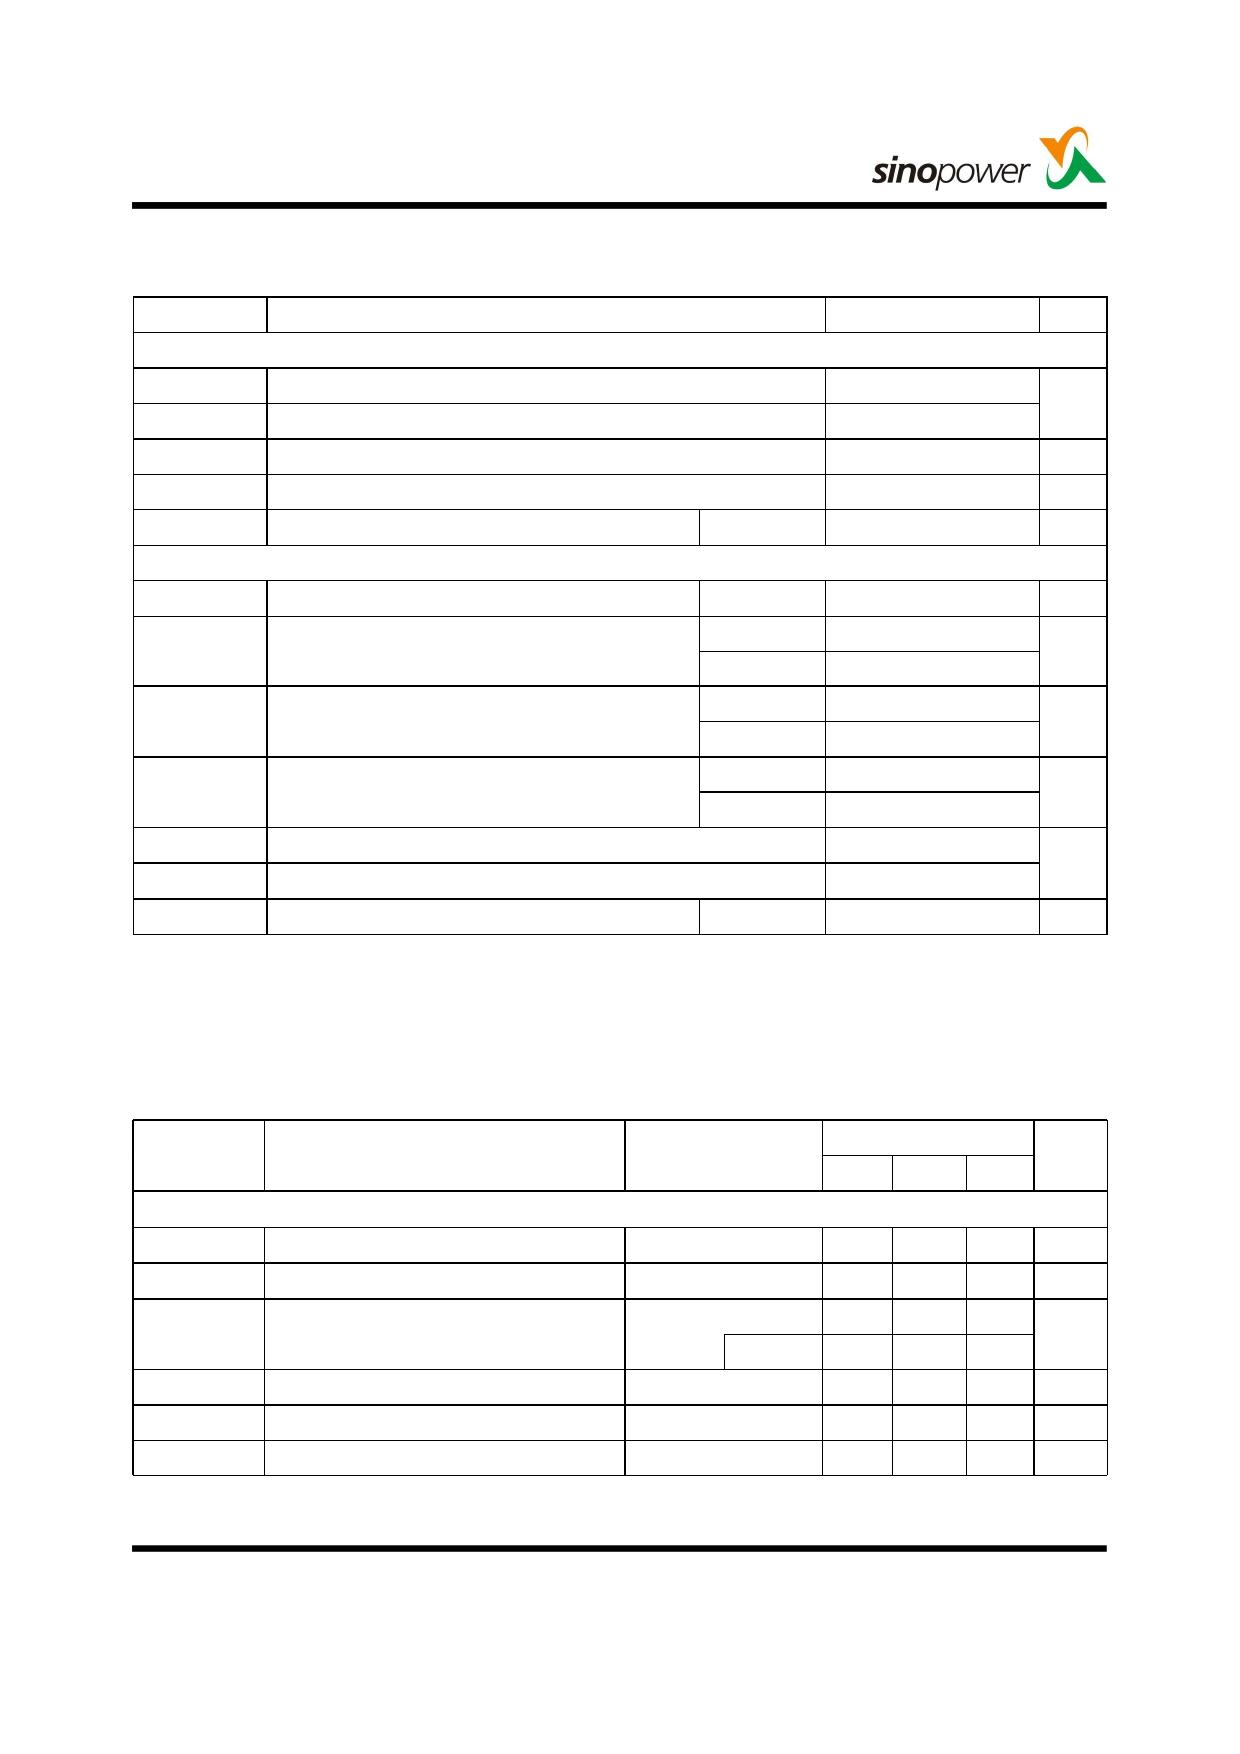 SM7506NSW pdf, equivalent, schematic